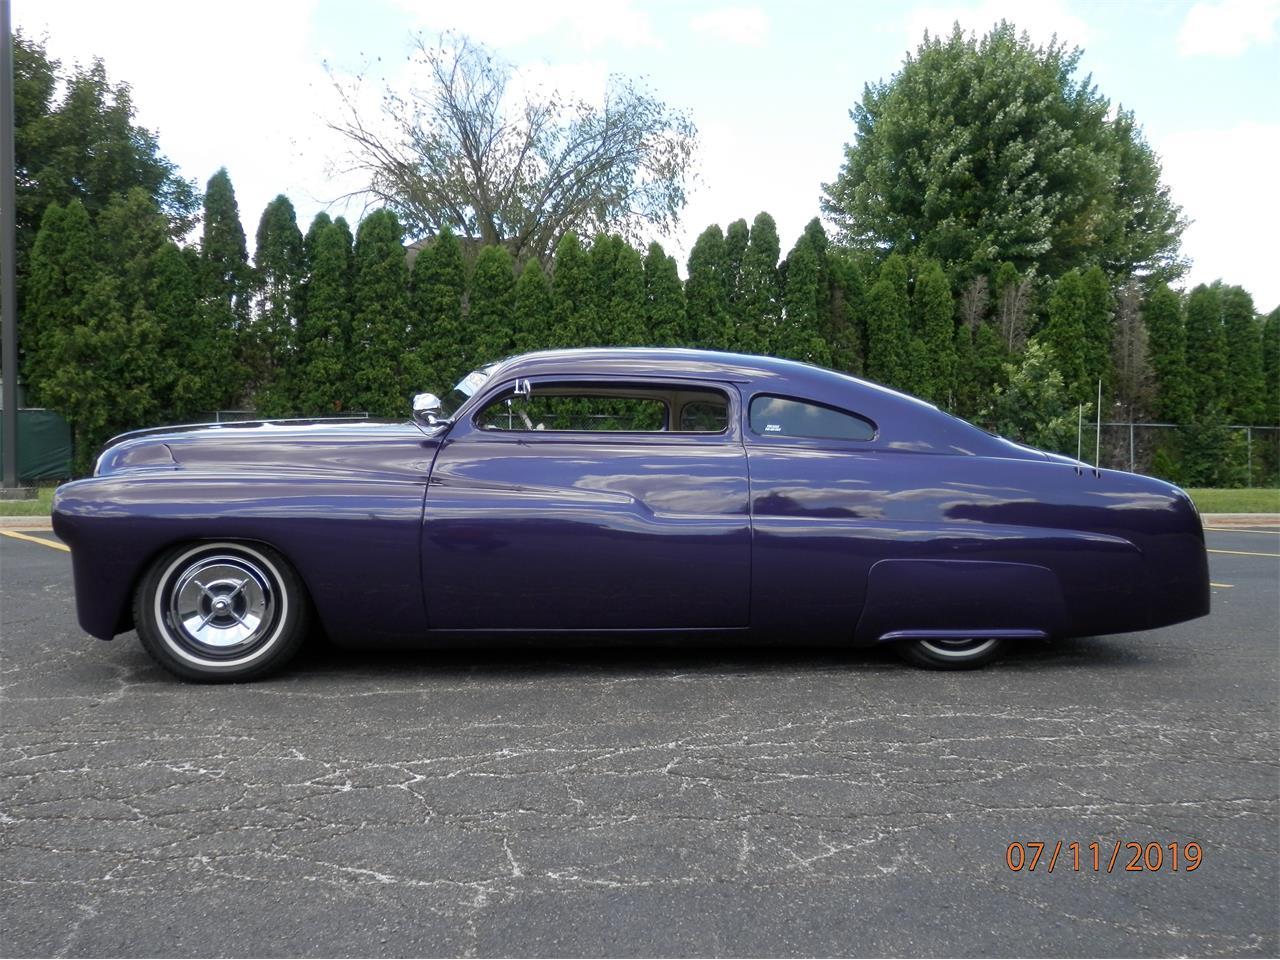 For Sale: 1951 Mercury Lead Sled in Troy, Michigan